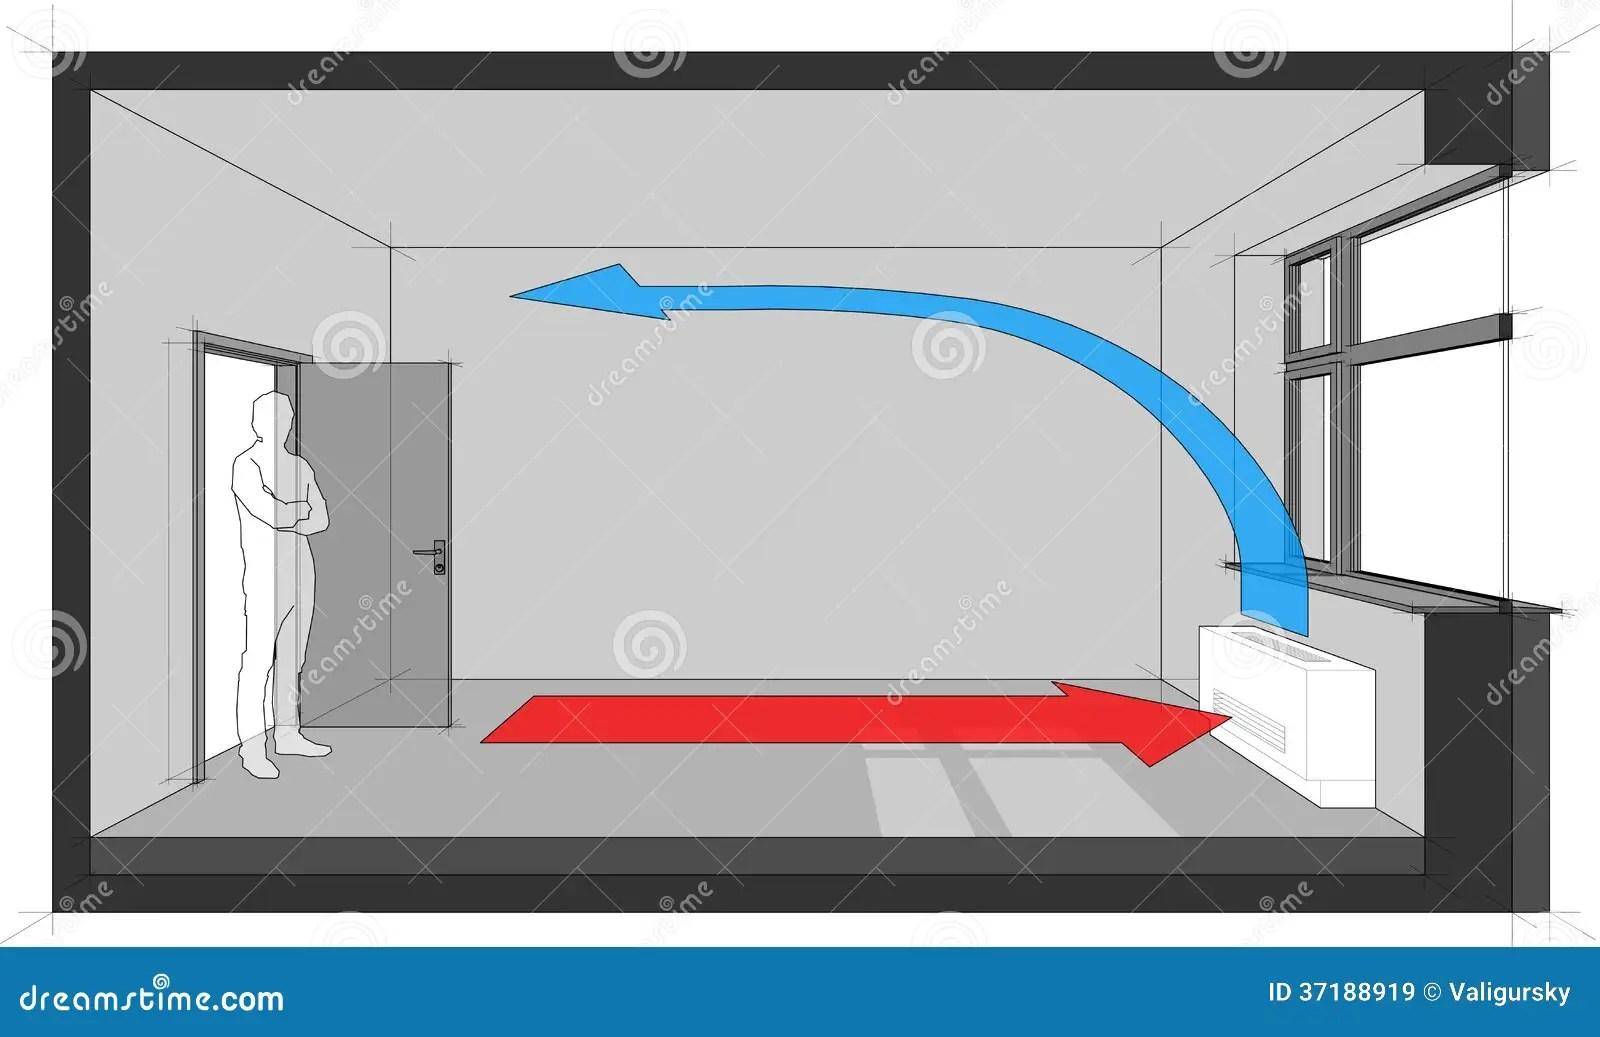 fan coil unit wiring diagram plc mitsubishi wall stock vector illustration of